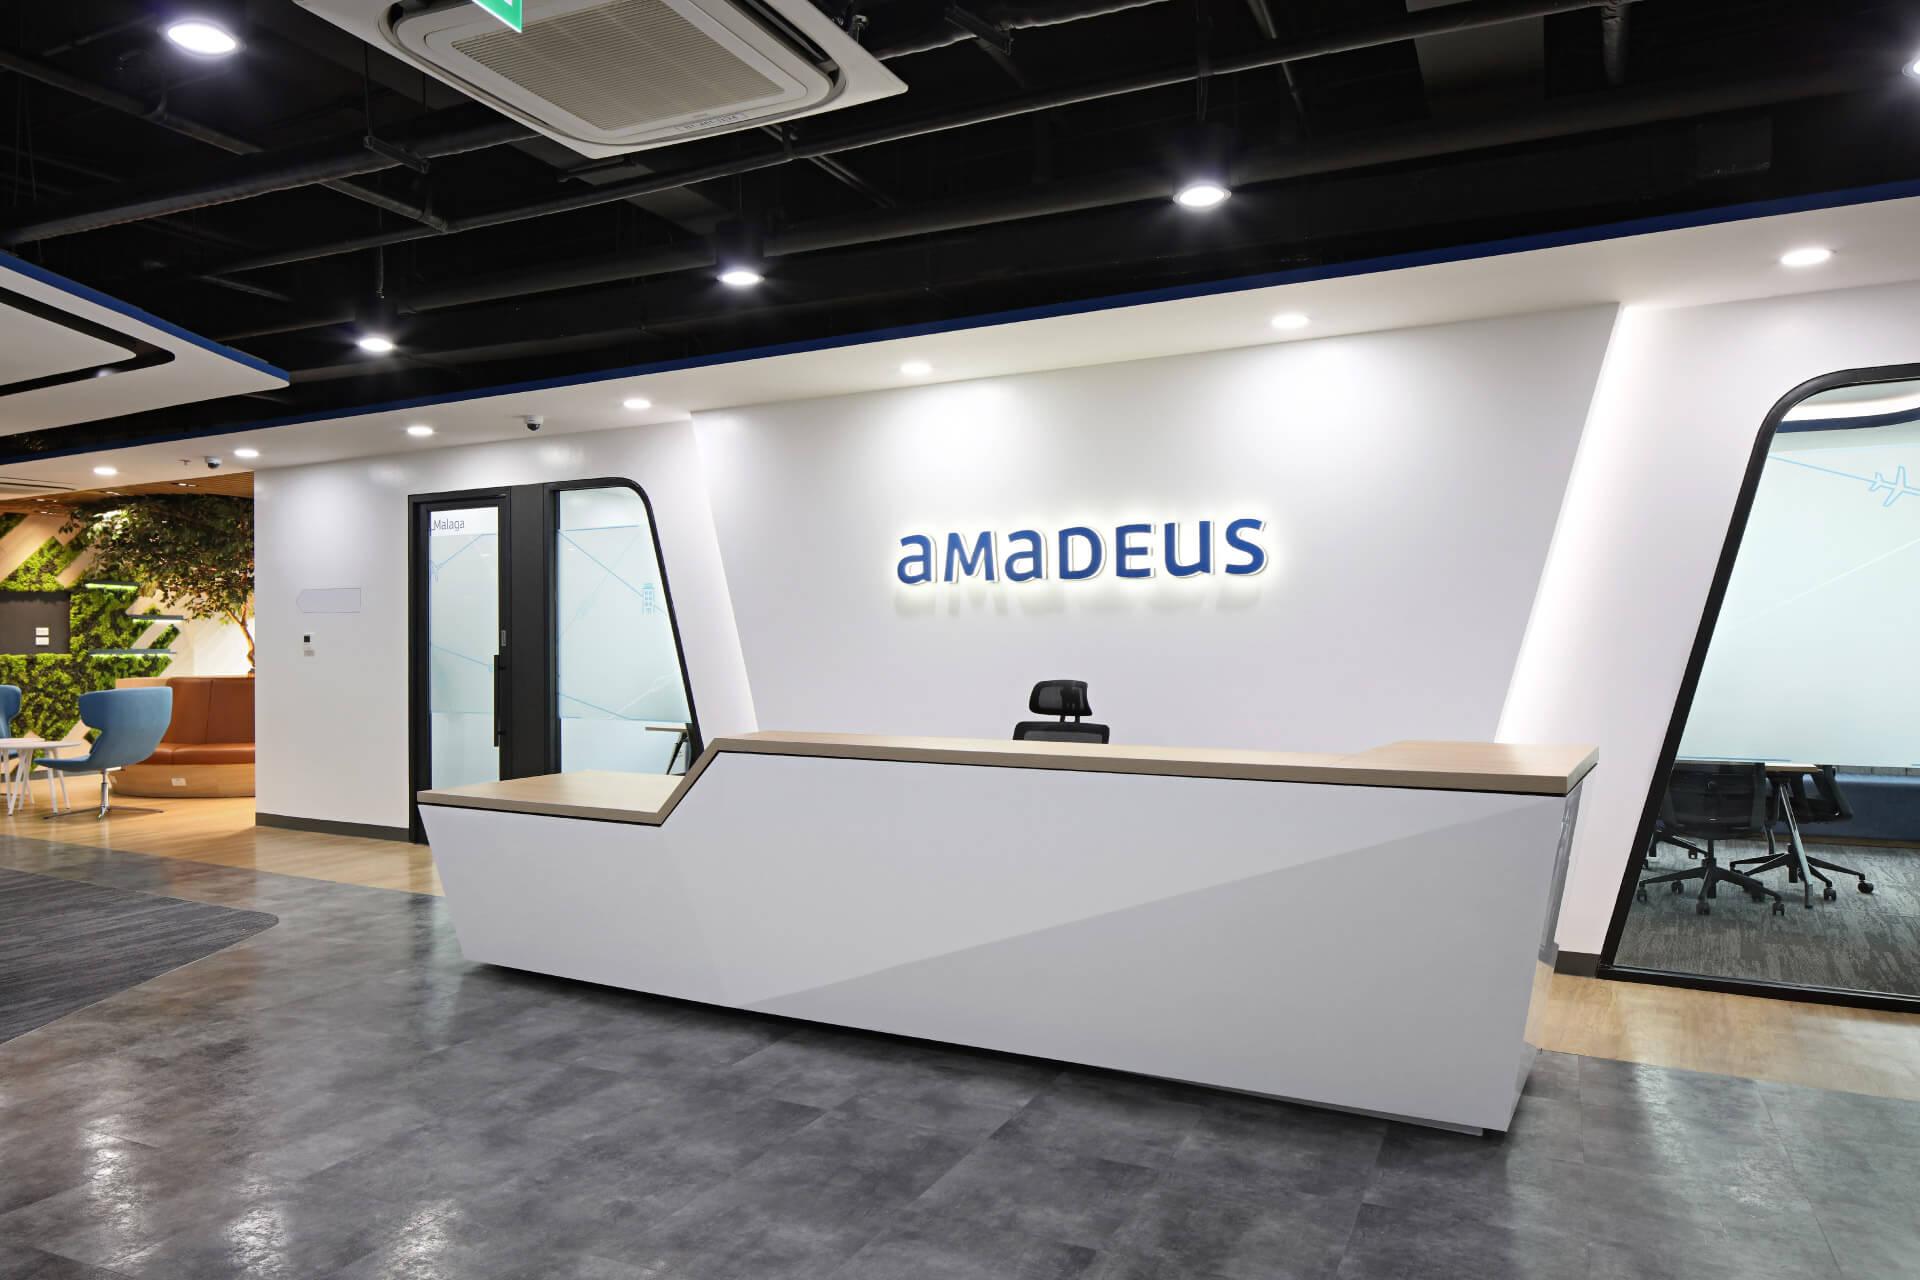 Amadeus Manila